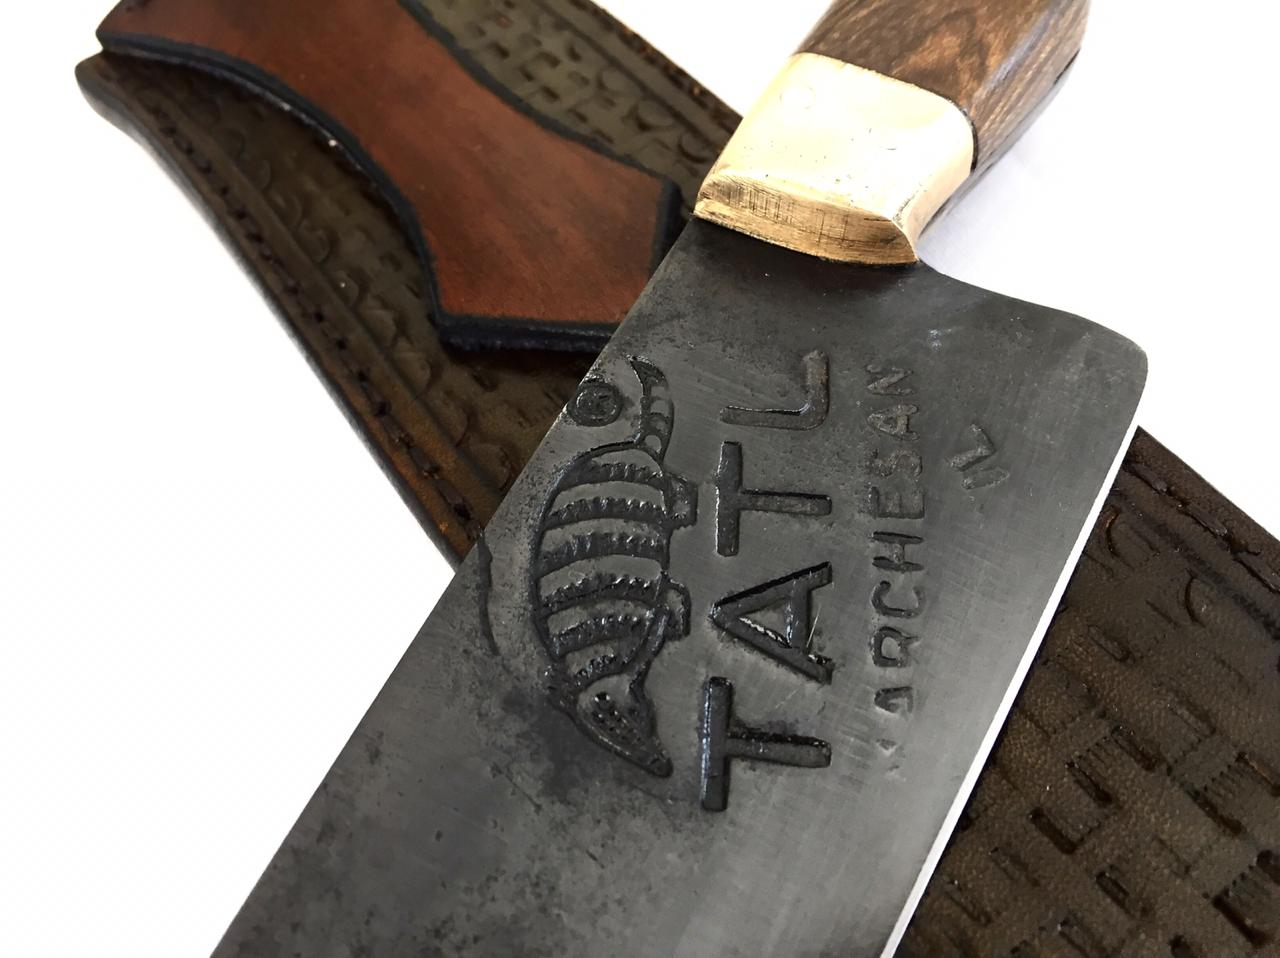 Faca artesanal negra disco de arado tatu marchesan 10 polegadas